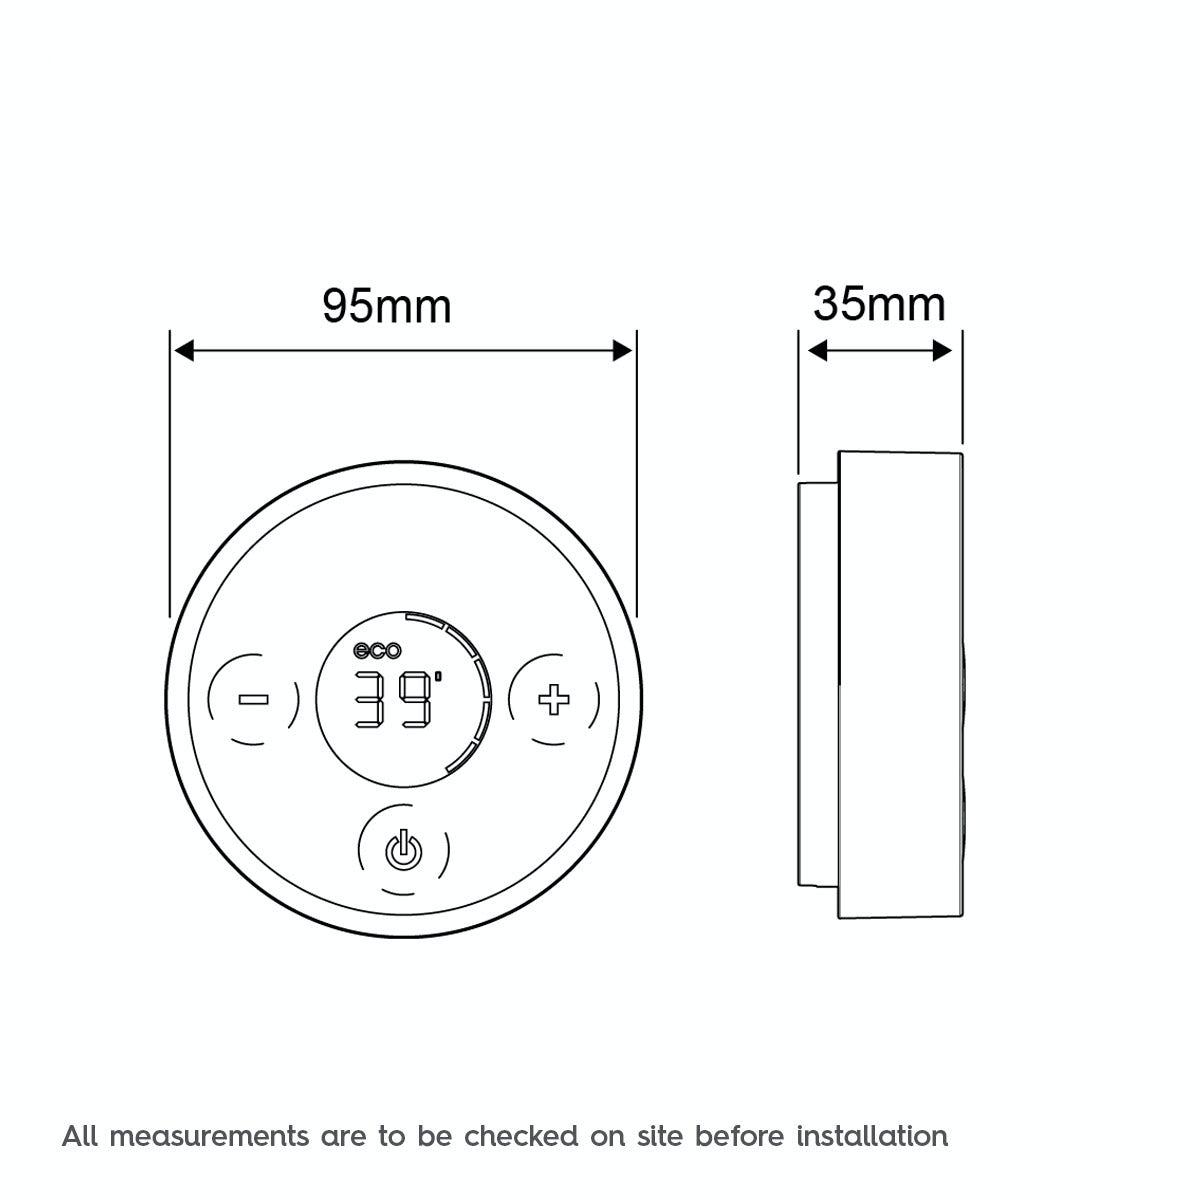 Dimensions for Mira Platinum single wireless digital shower controller